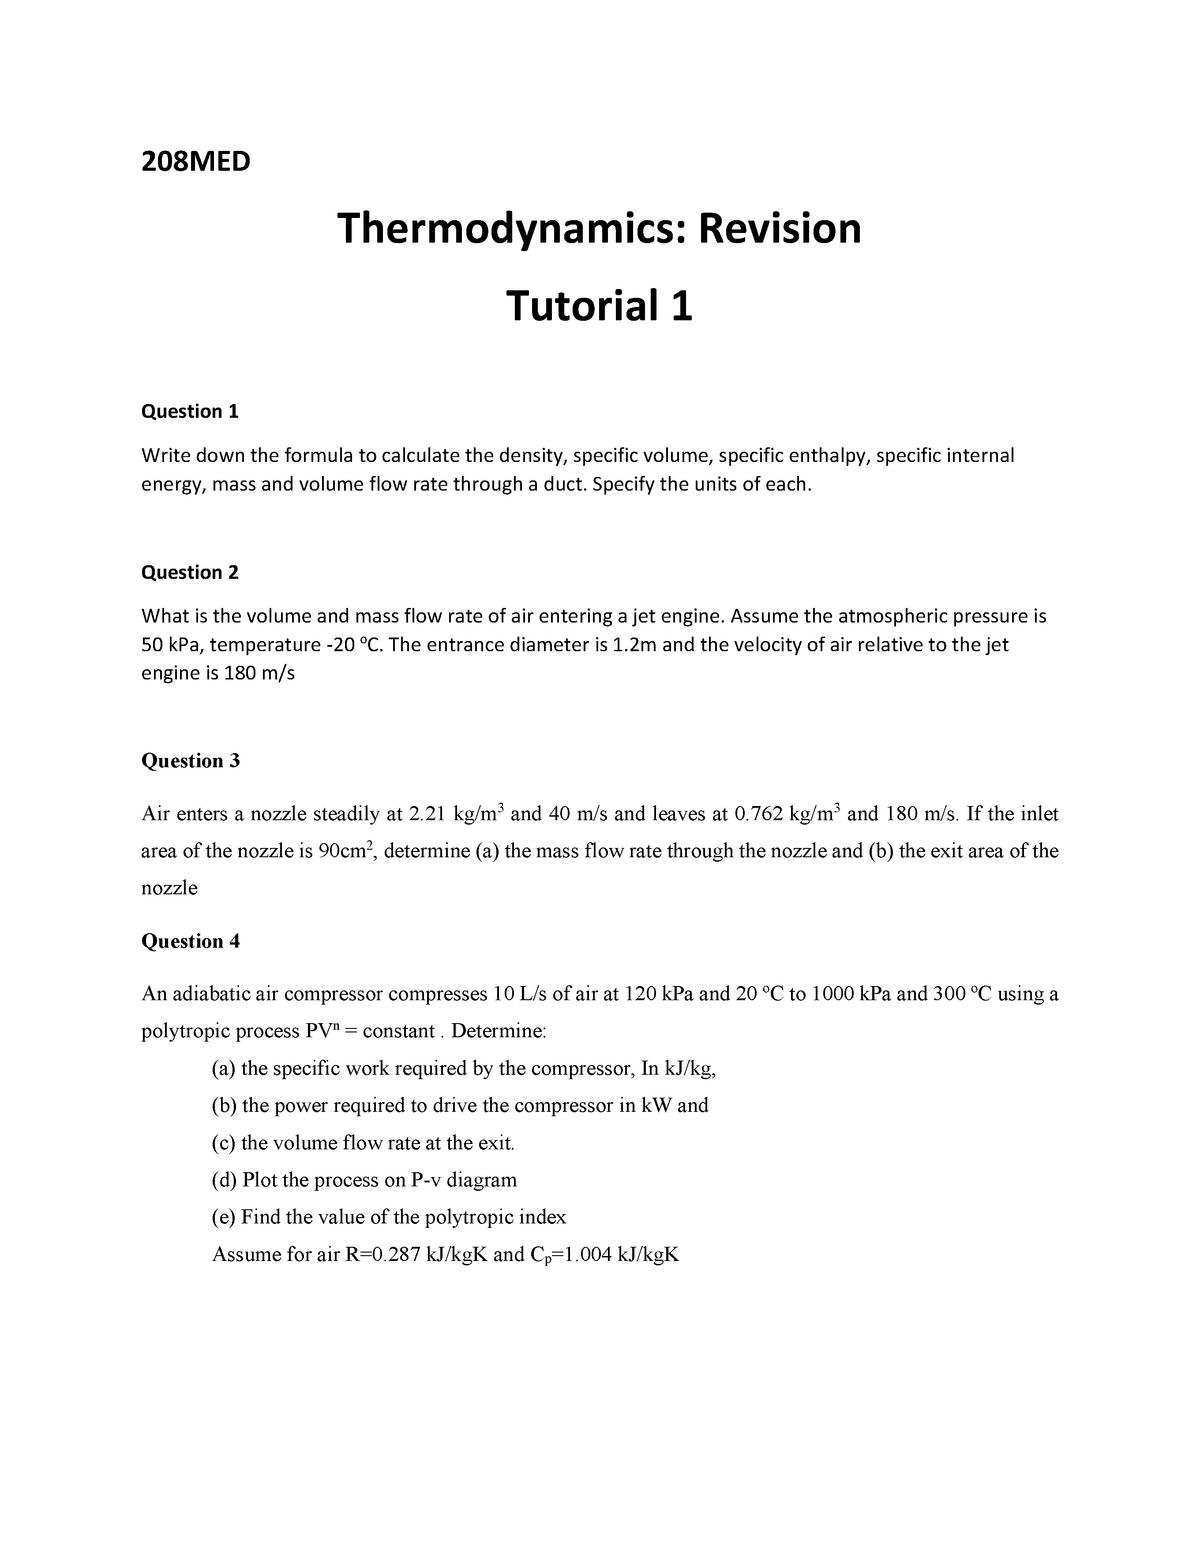 Tutrorial 1 - thermodynamics tutorial week 1 - 208MED